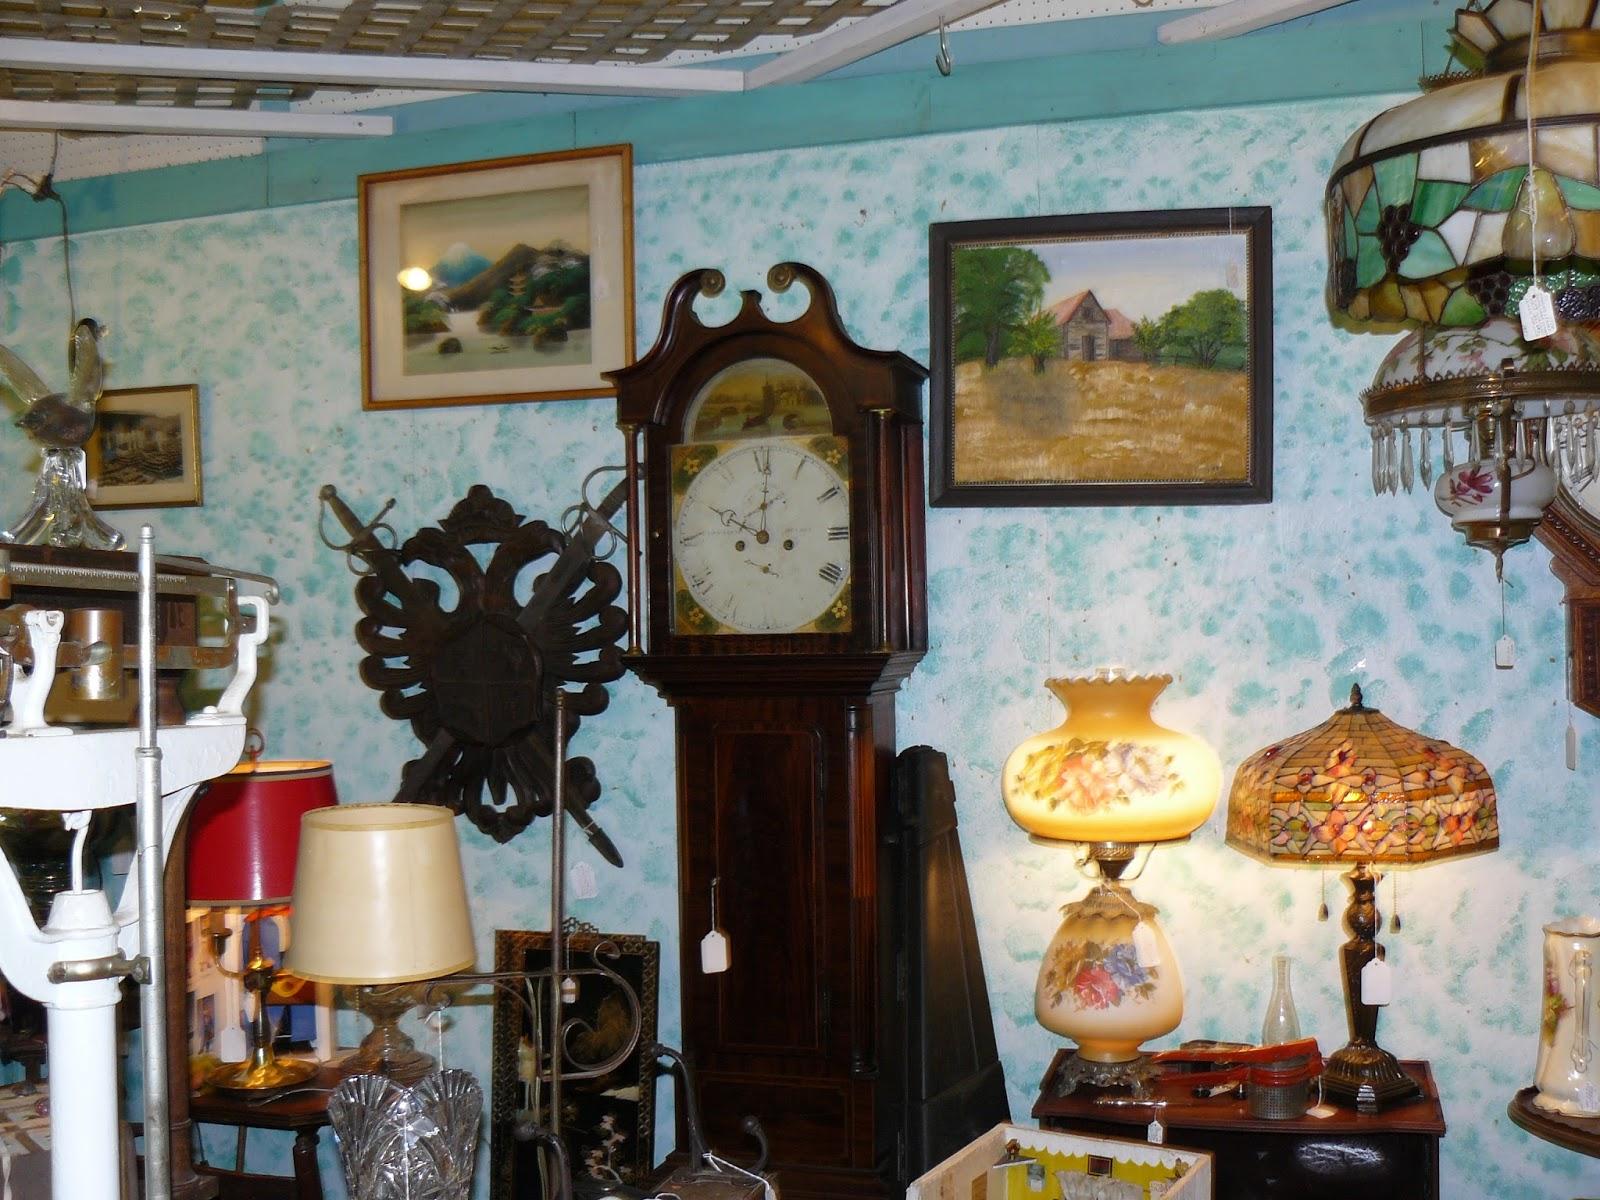 SCRANBERRY COOP : Scranberry Coop Antique Store